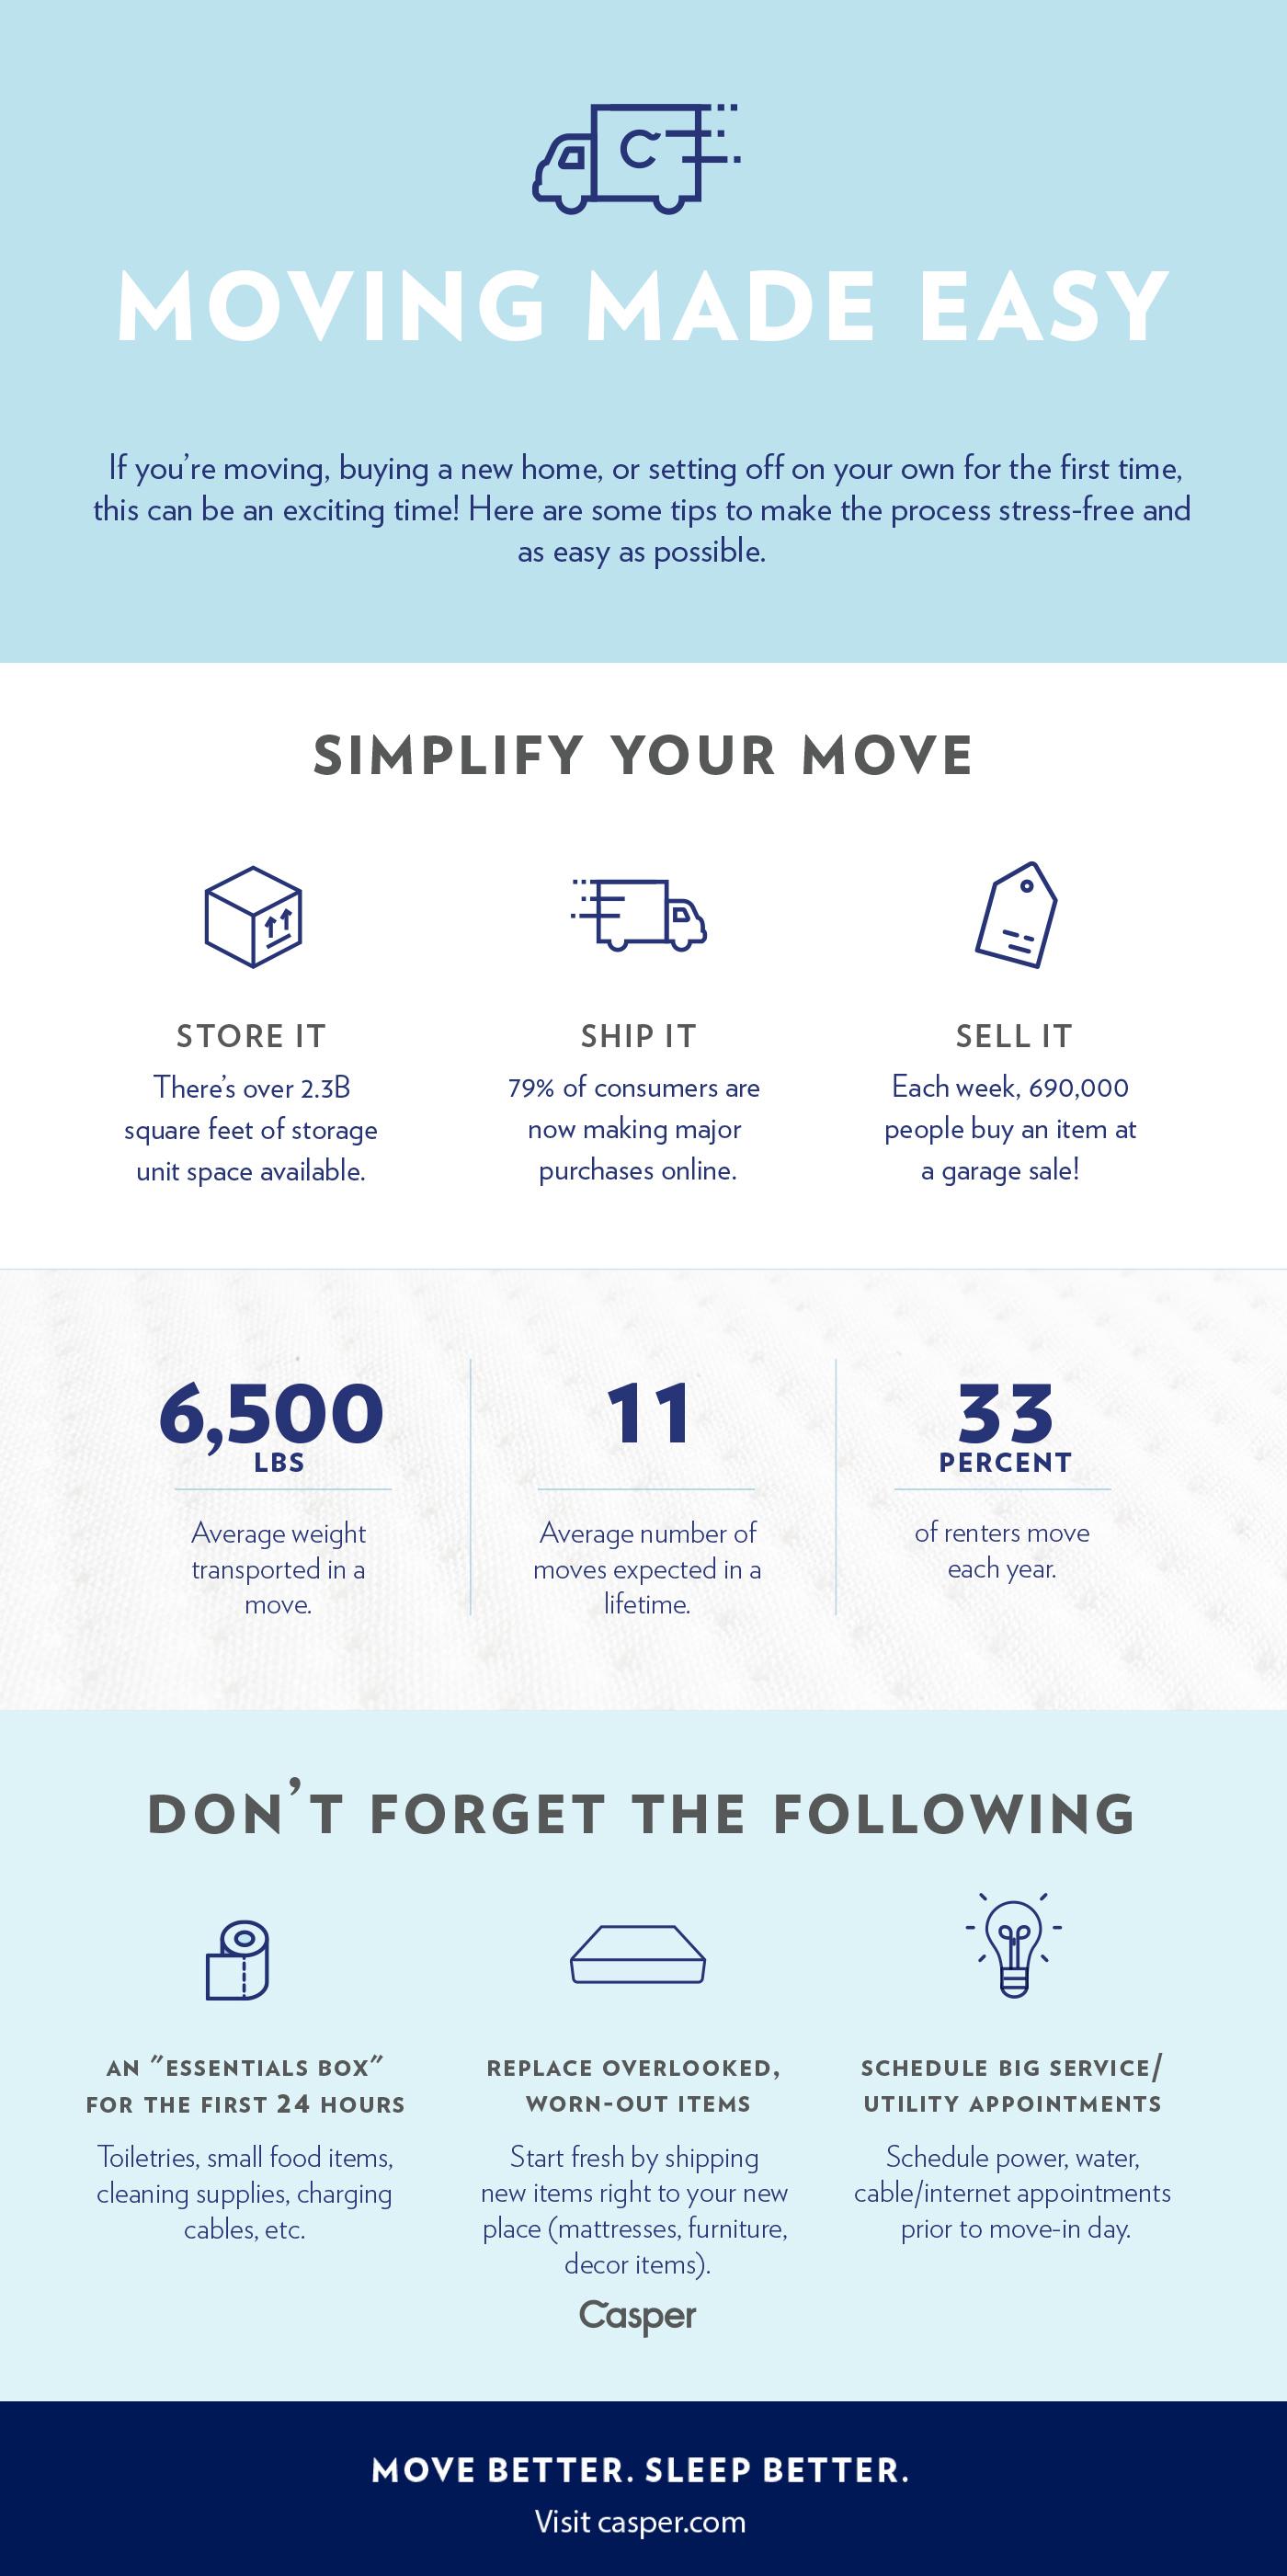 casper mattress guide staxup storage